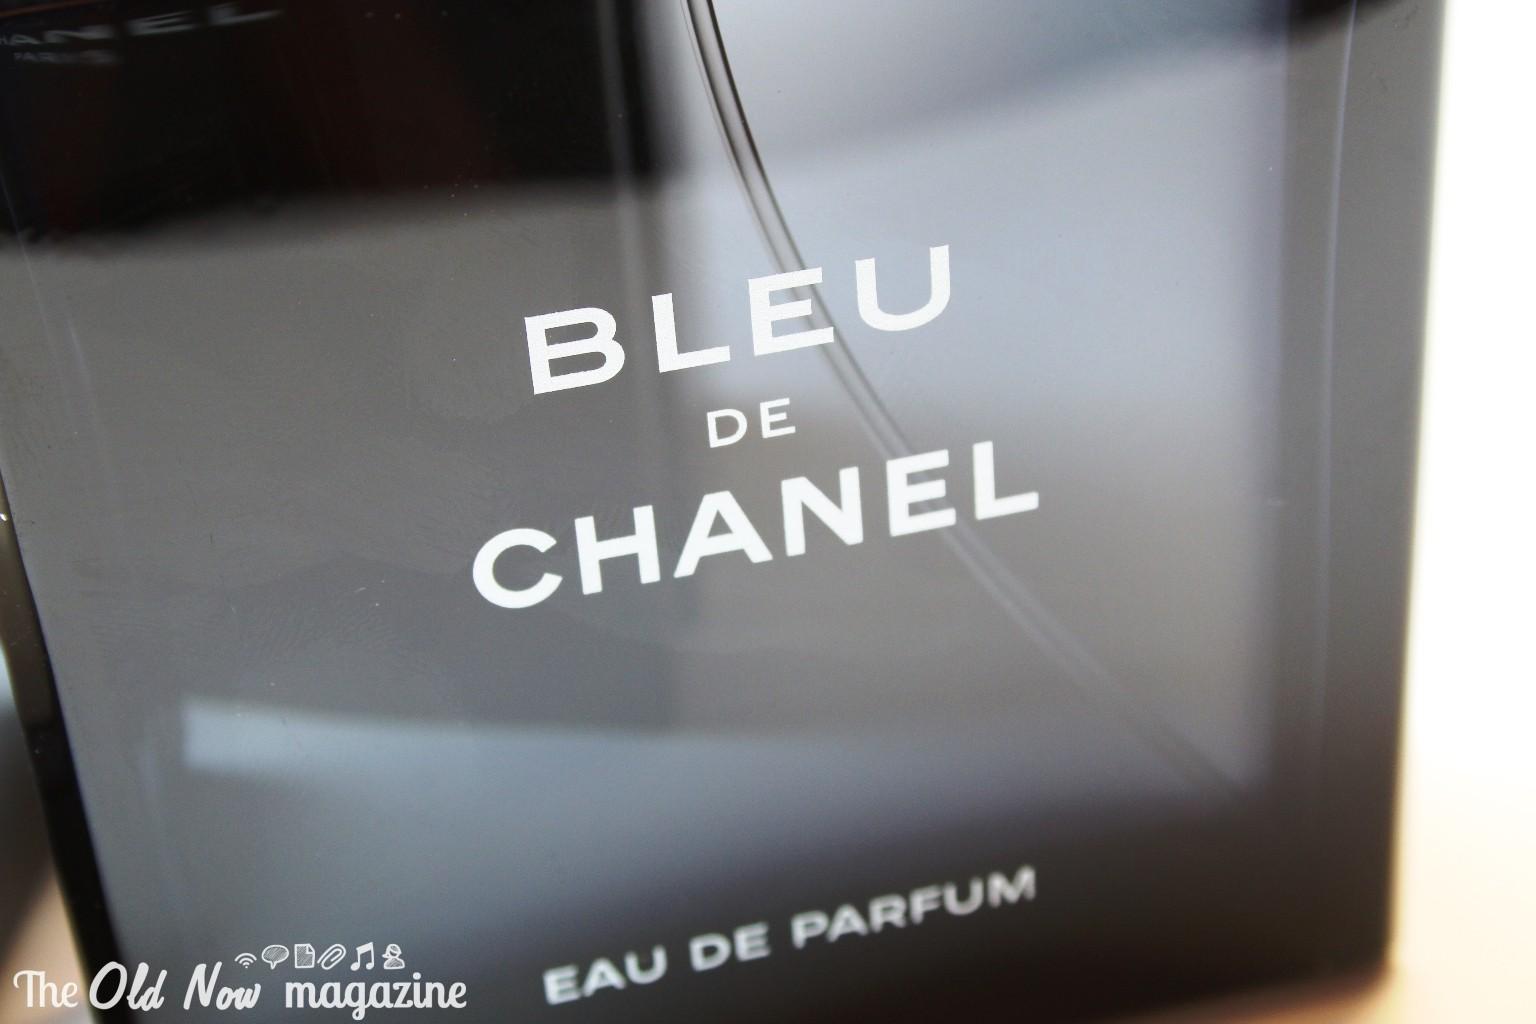 Bleu de Chanel CHANEL THEOLDNOW (7)